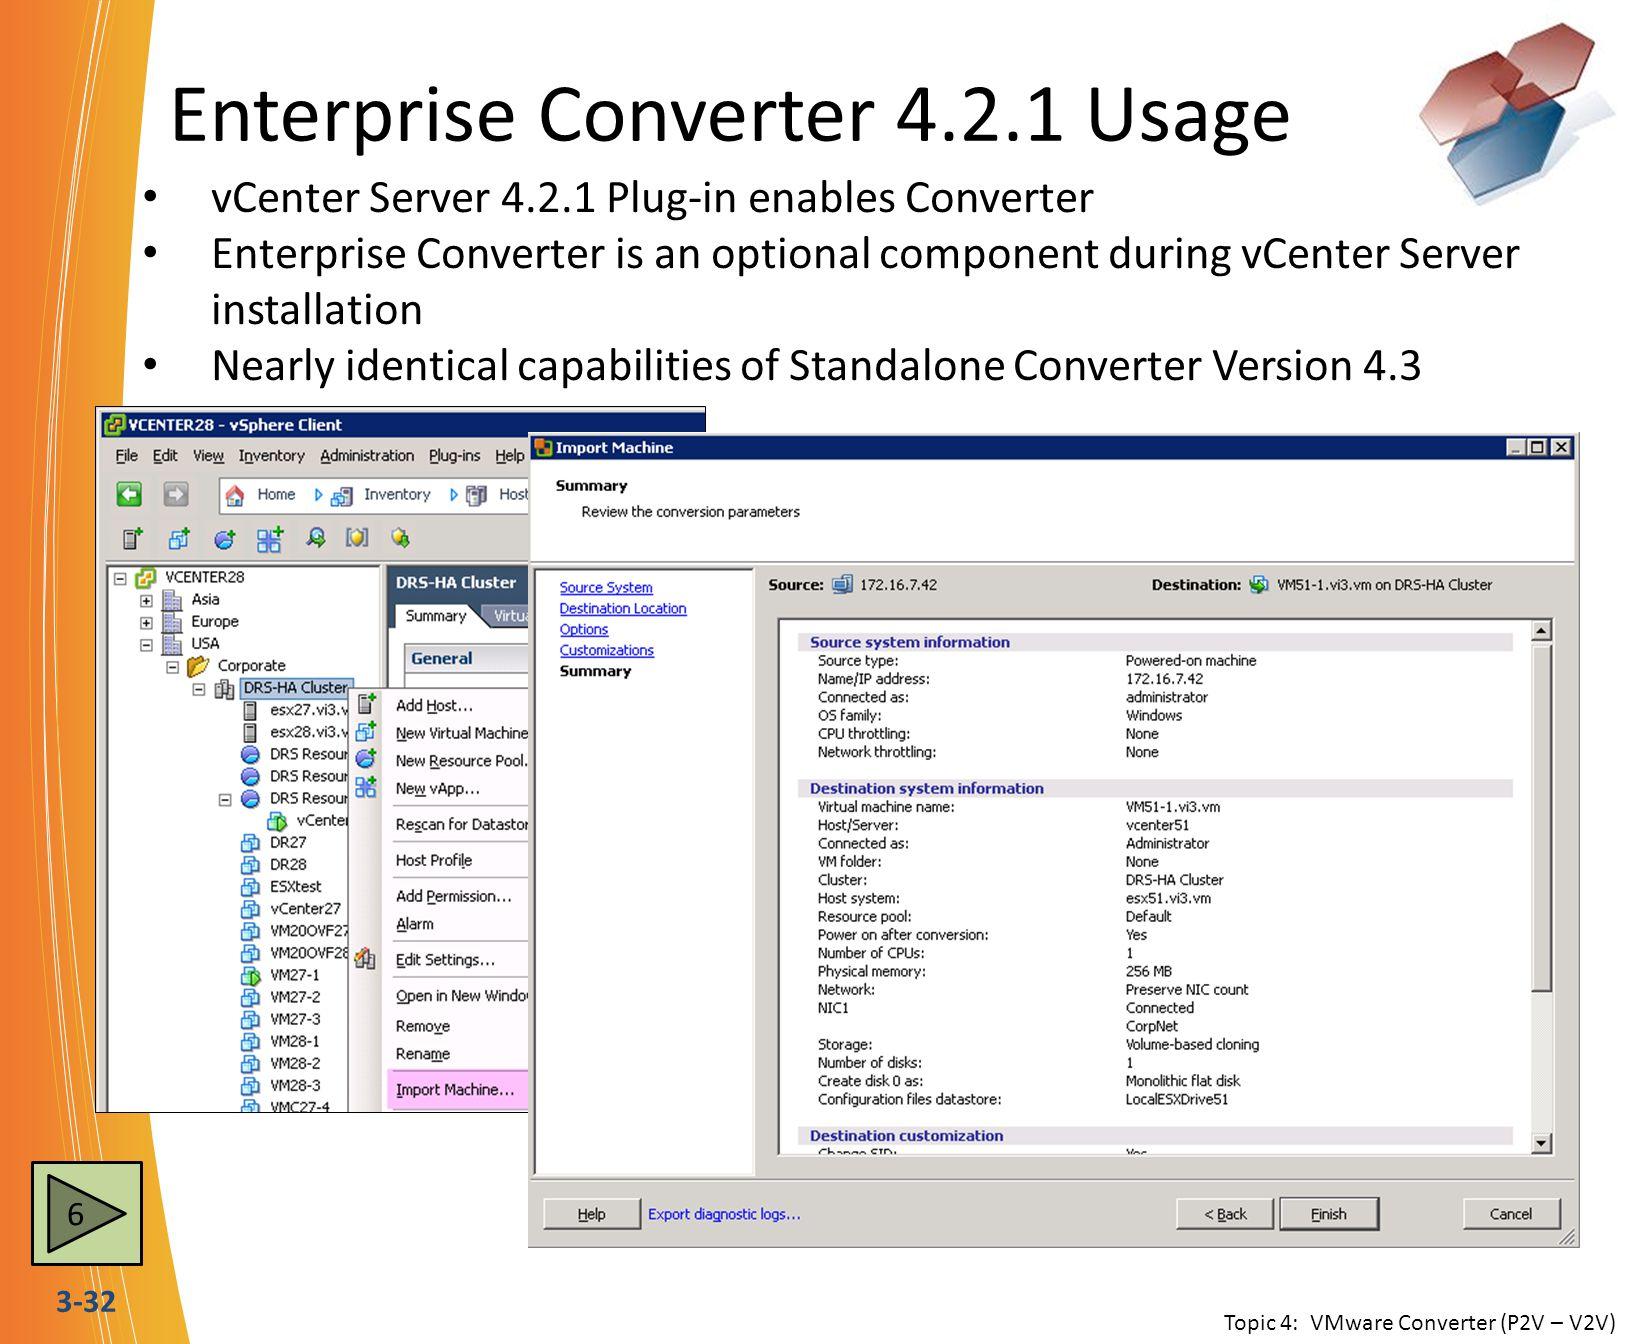 Enterprise Converter 4.2.1 Usage